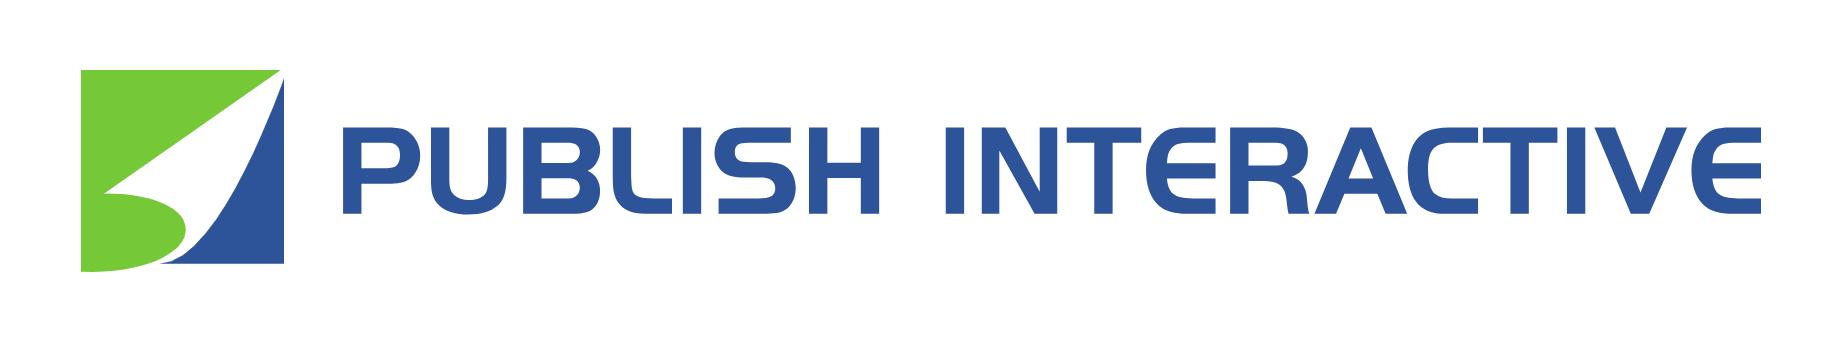 2019-05-06--Publish-Interactive.png